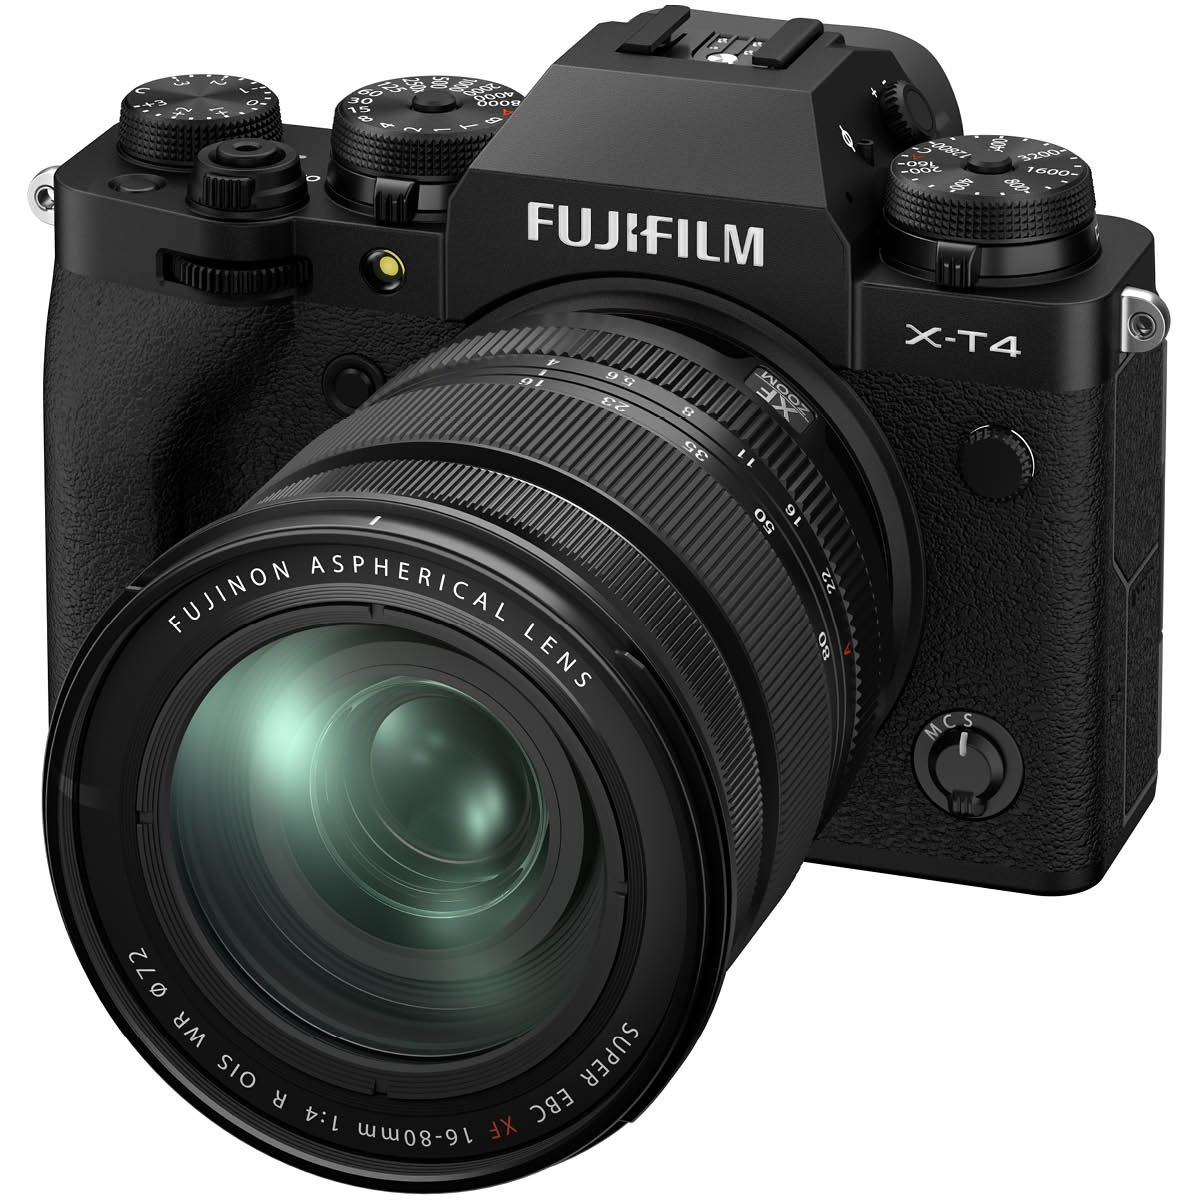 Fujifilm X-T4 Kit mit 16-80 mm 1:4,0 Schwarz